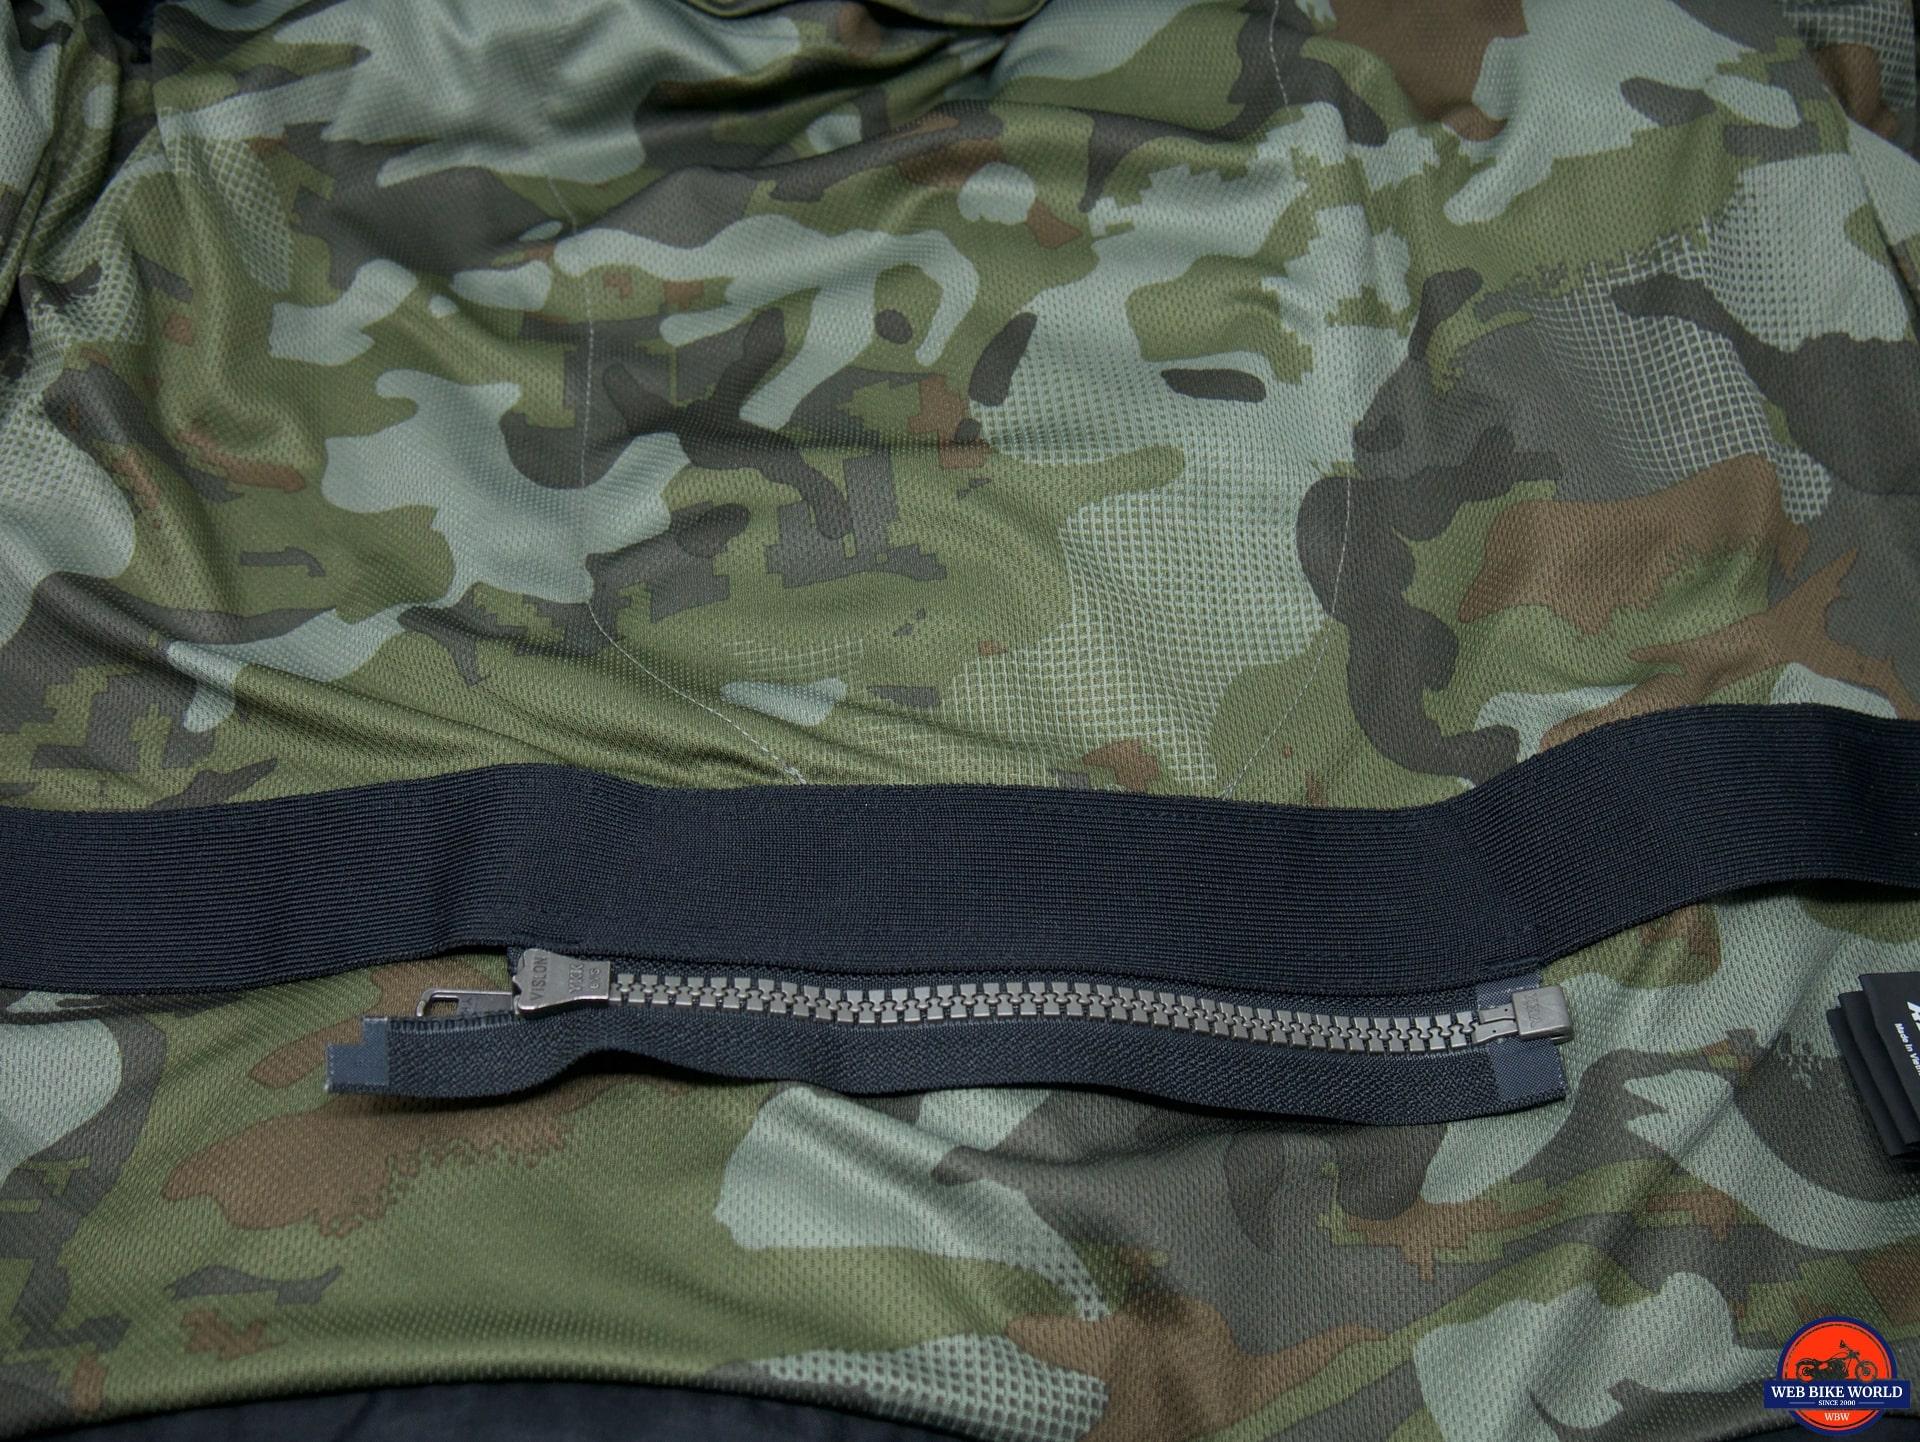 REV'IT Tracer Air Overshirt inner mesh lining